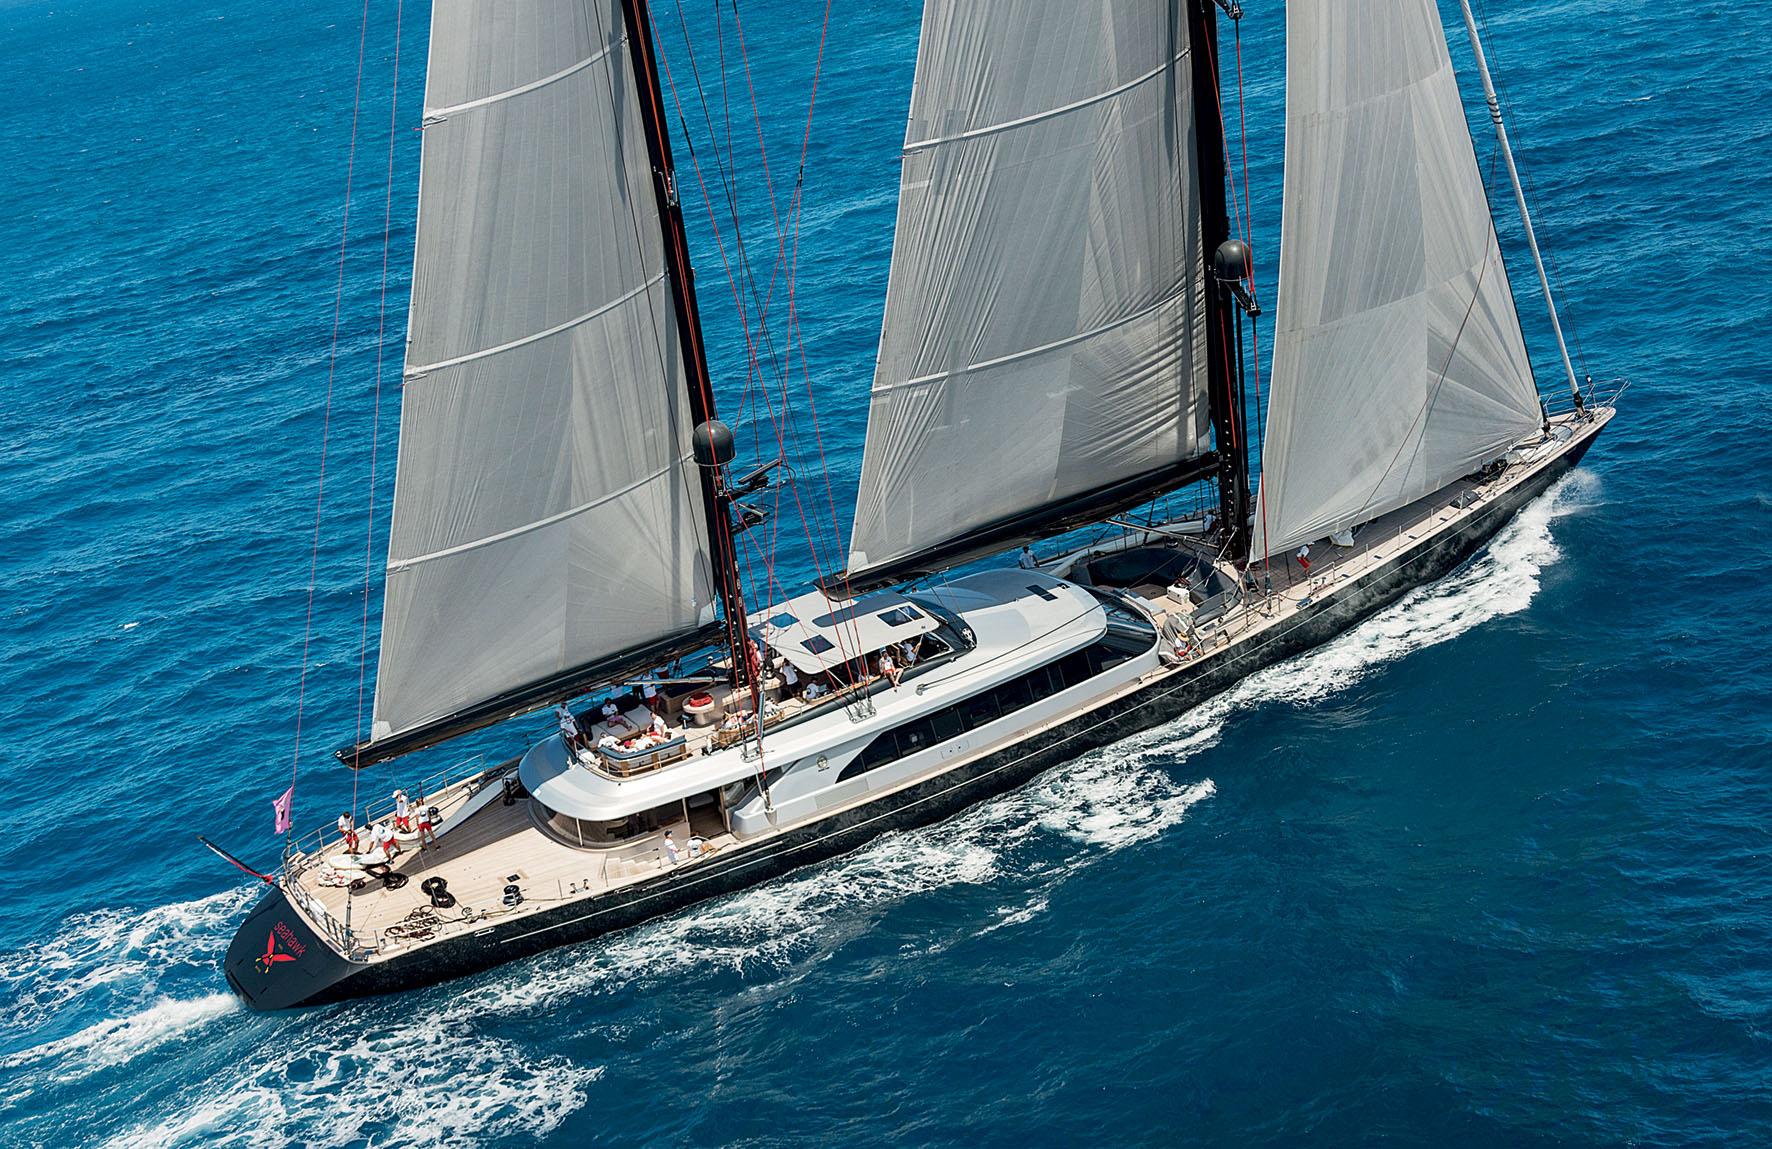 SuperyachtLife-On-The-High-Seas-Tony-Harris-Fort-Lauderdale-Venice-Magazine-5